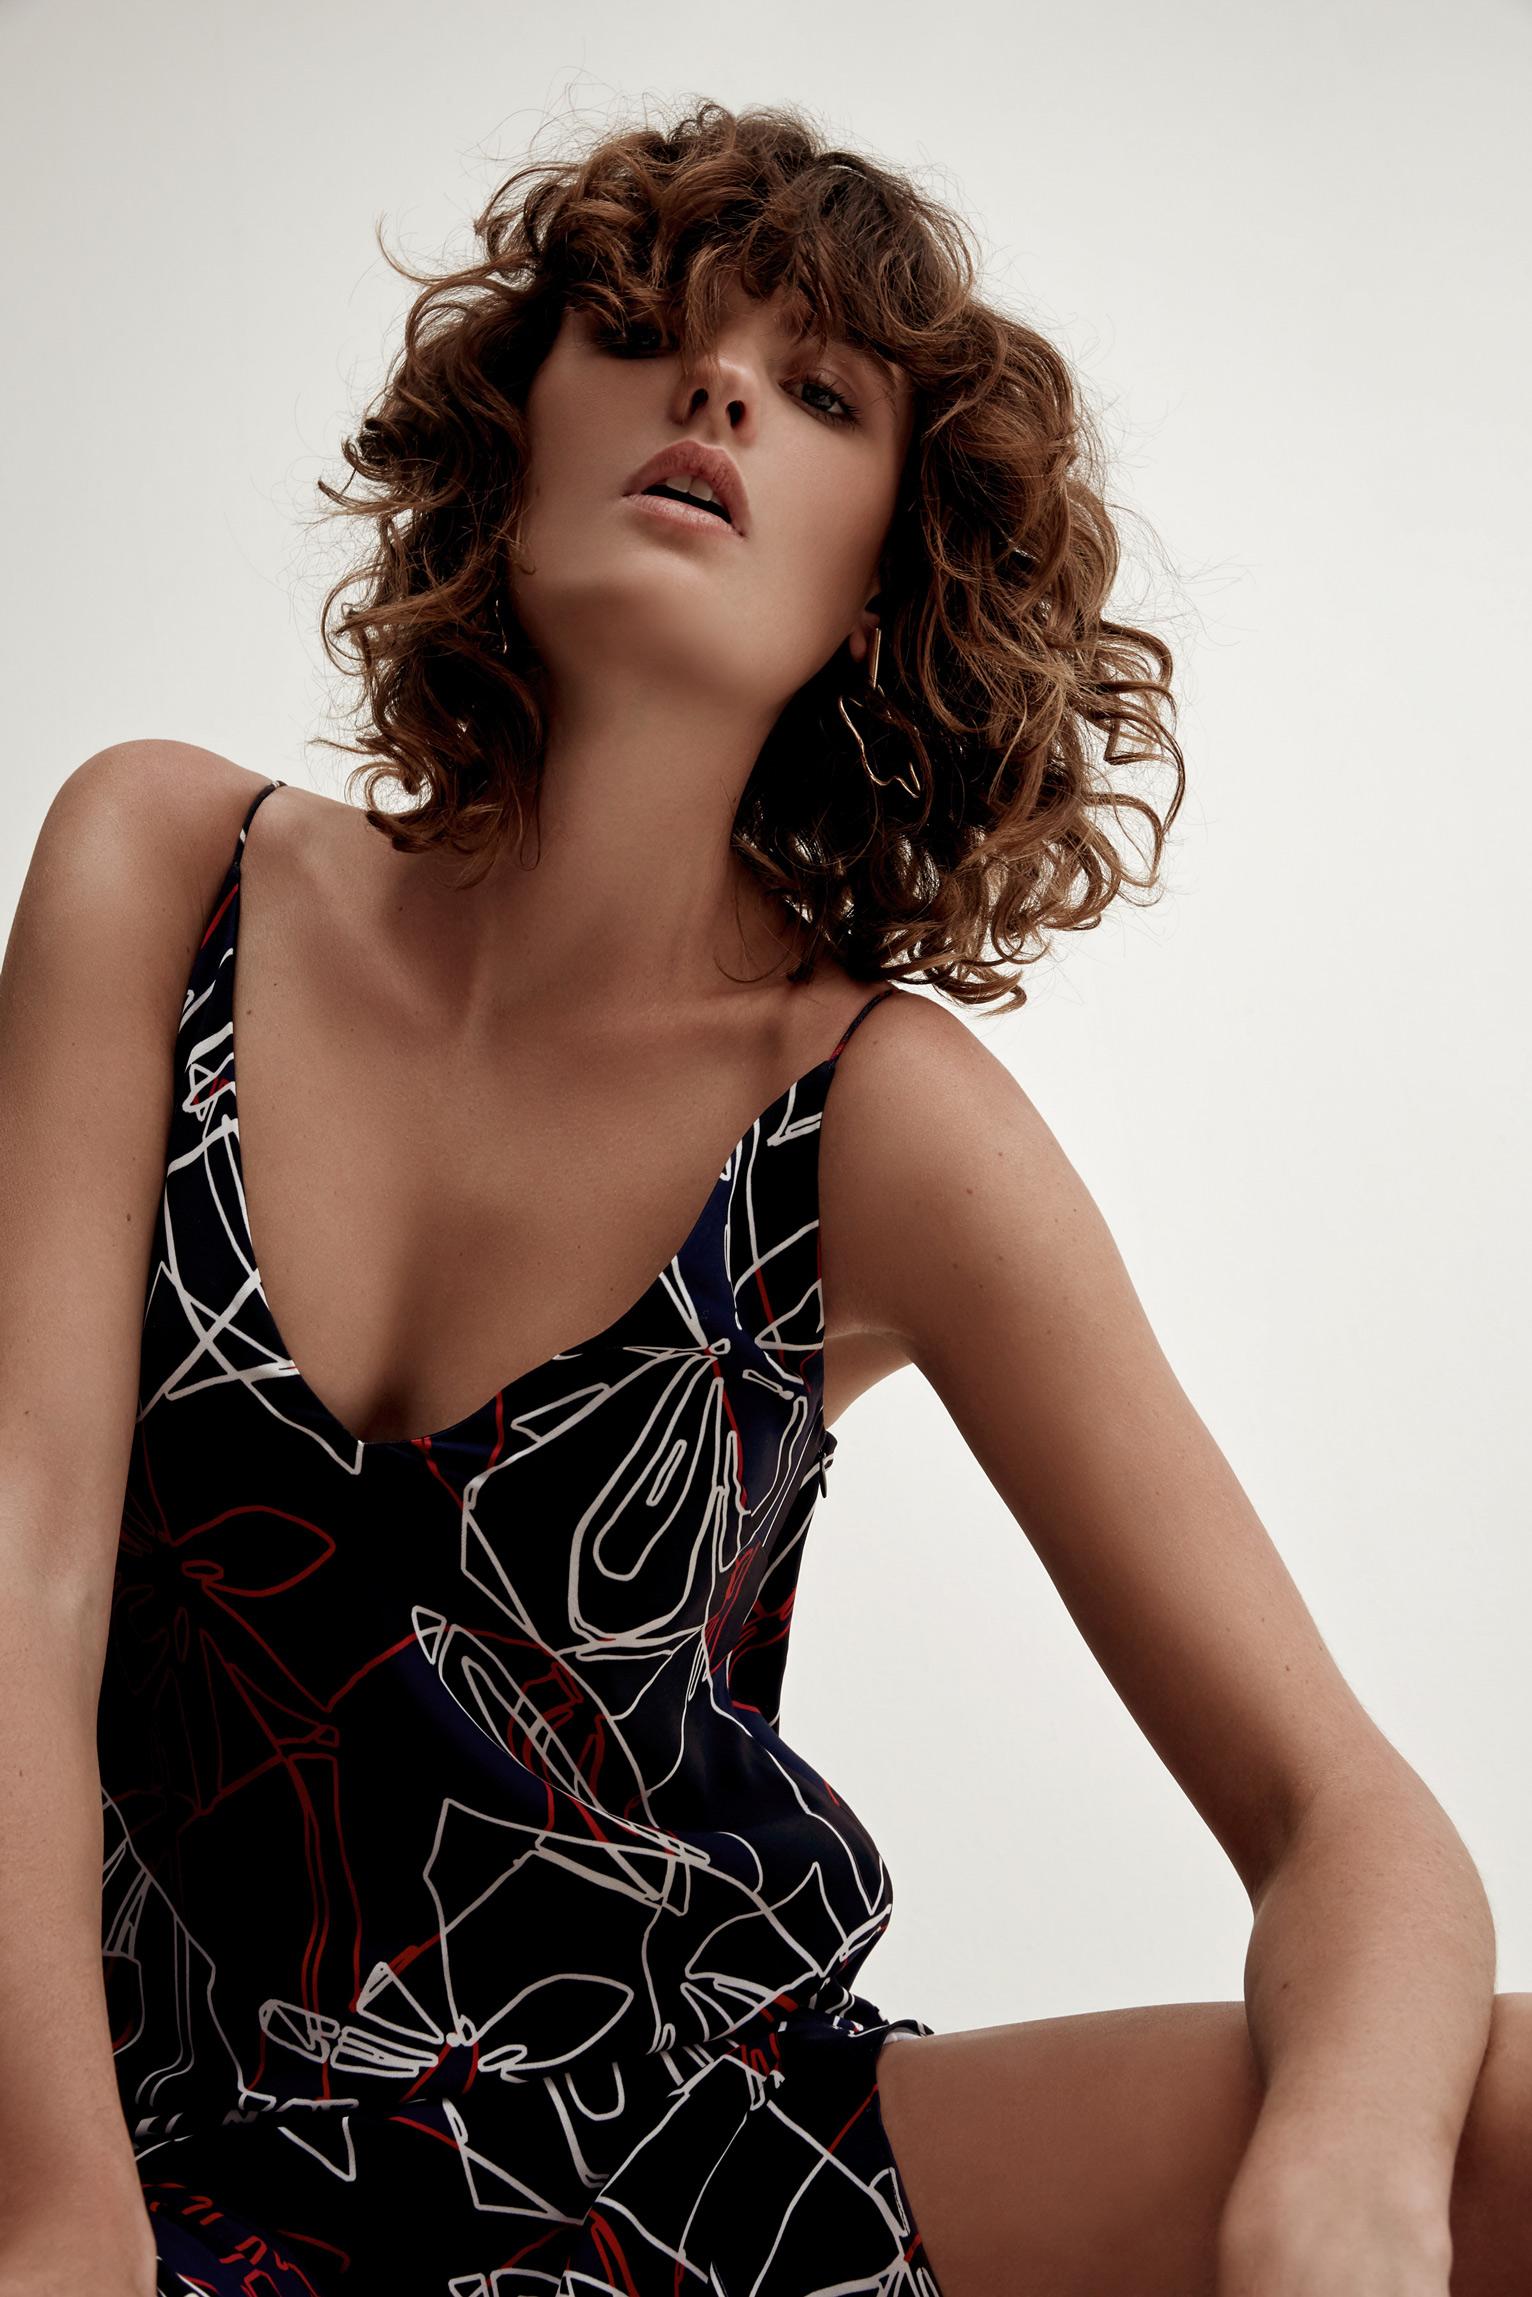 Shop C/MEO Infinite Dress (Coming Soon).